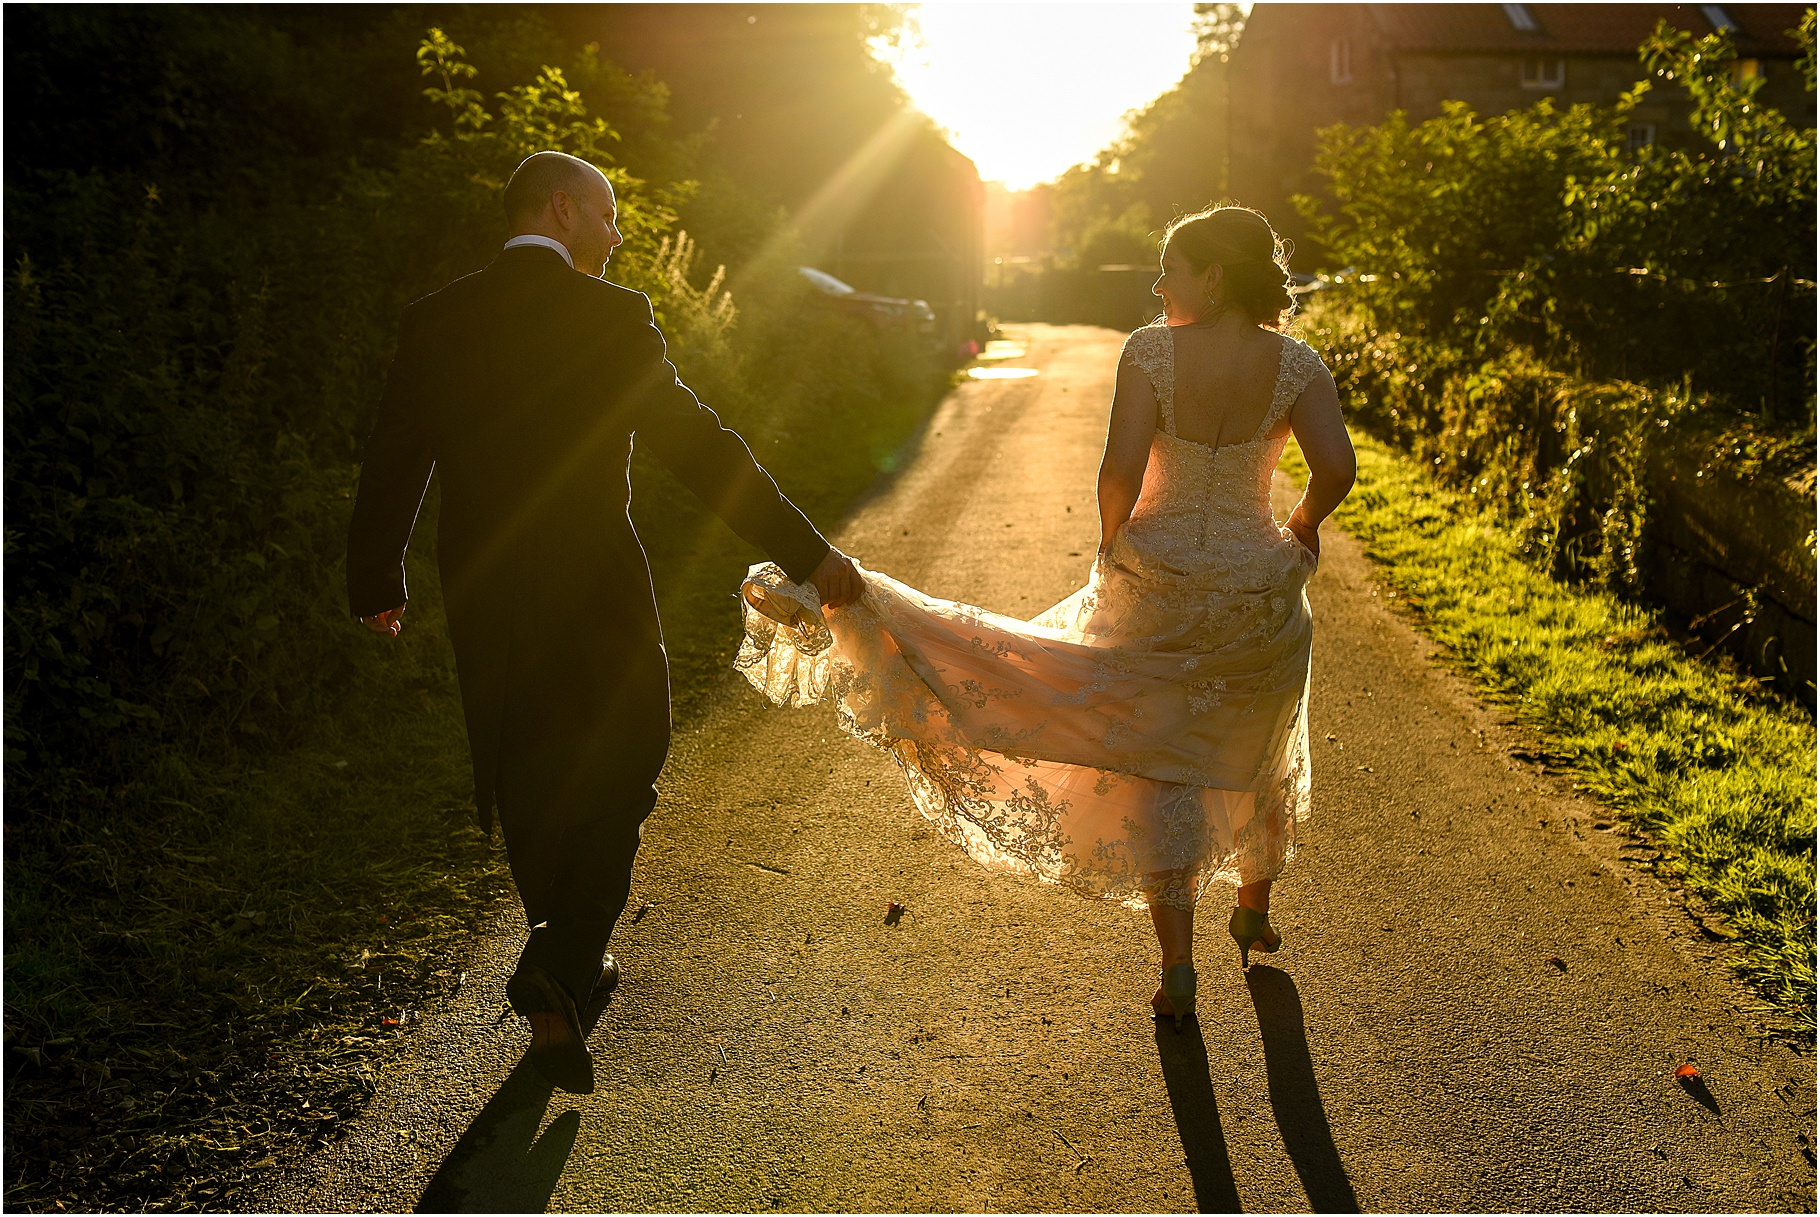 dan-wootton-photography-2017-weddings-187.jpg